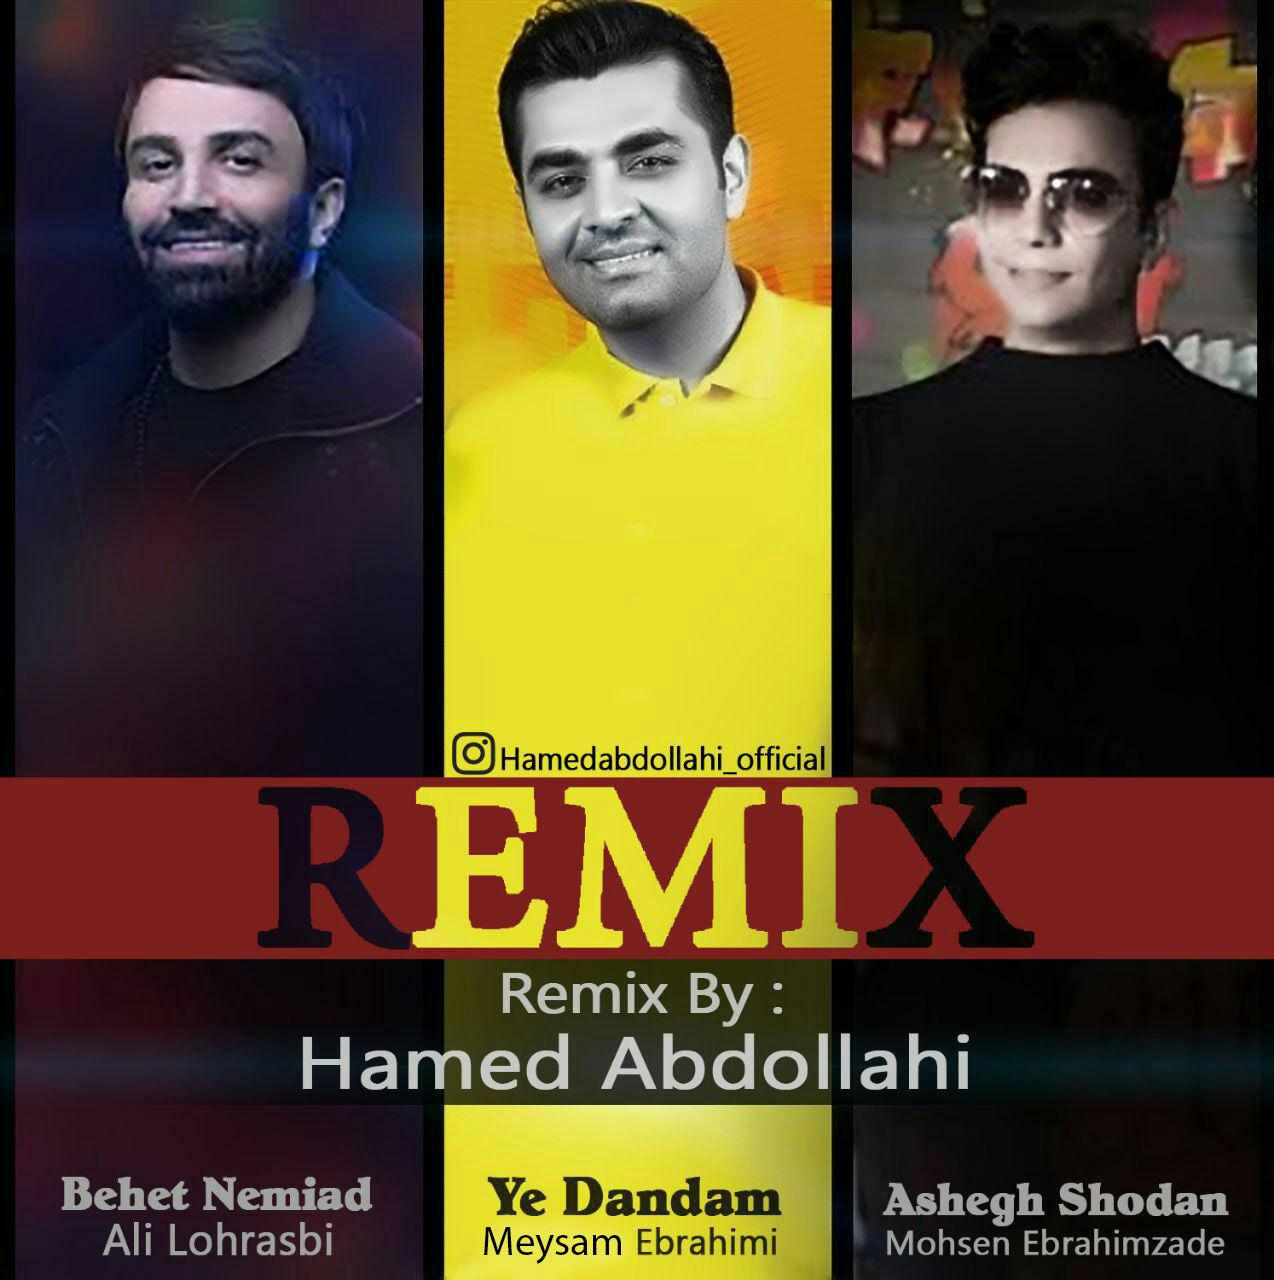 Mohsen Ebrahimzadeh and Meysam Ebrahimi - (Remix Hamed Abdollahi)